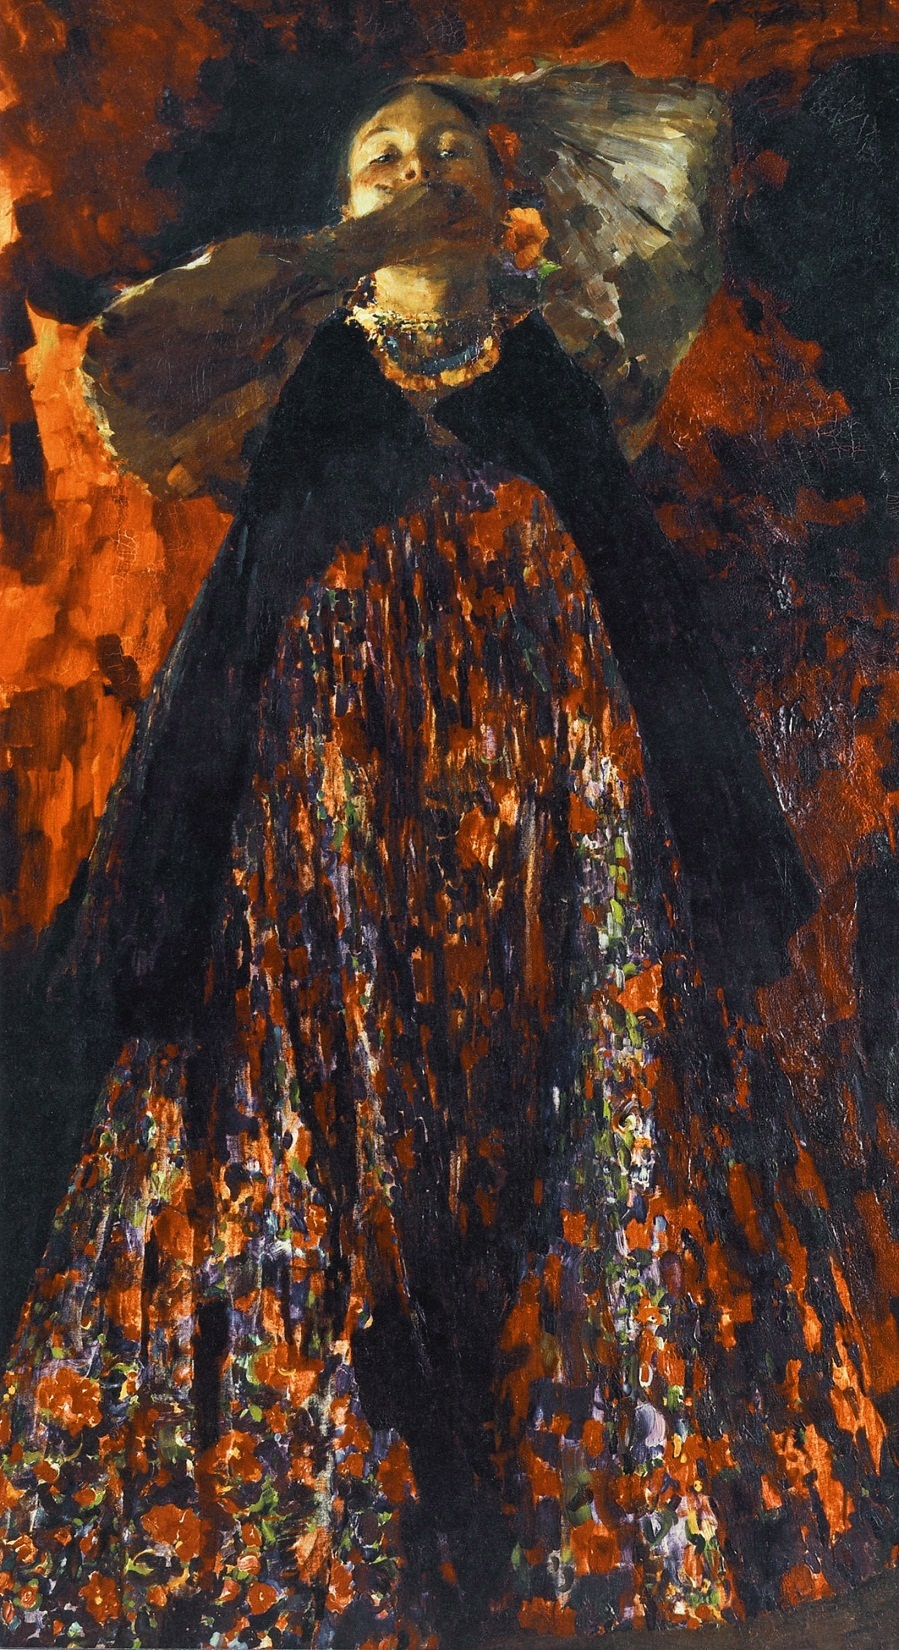 Малявин Филипп Андреевич (1869-1940) «Девка» 1903 ГТГ